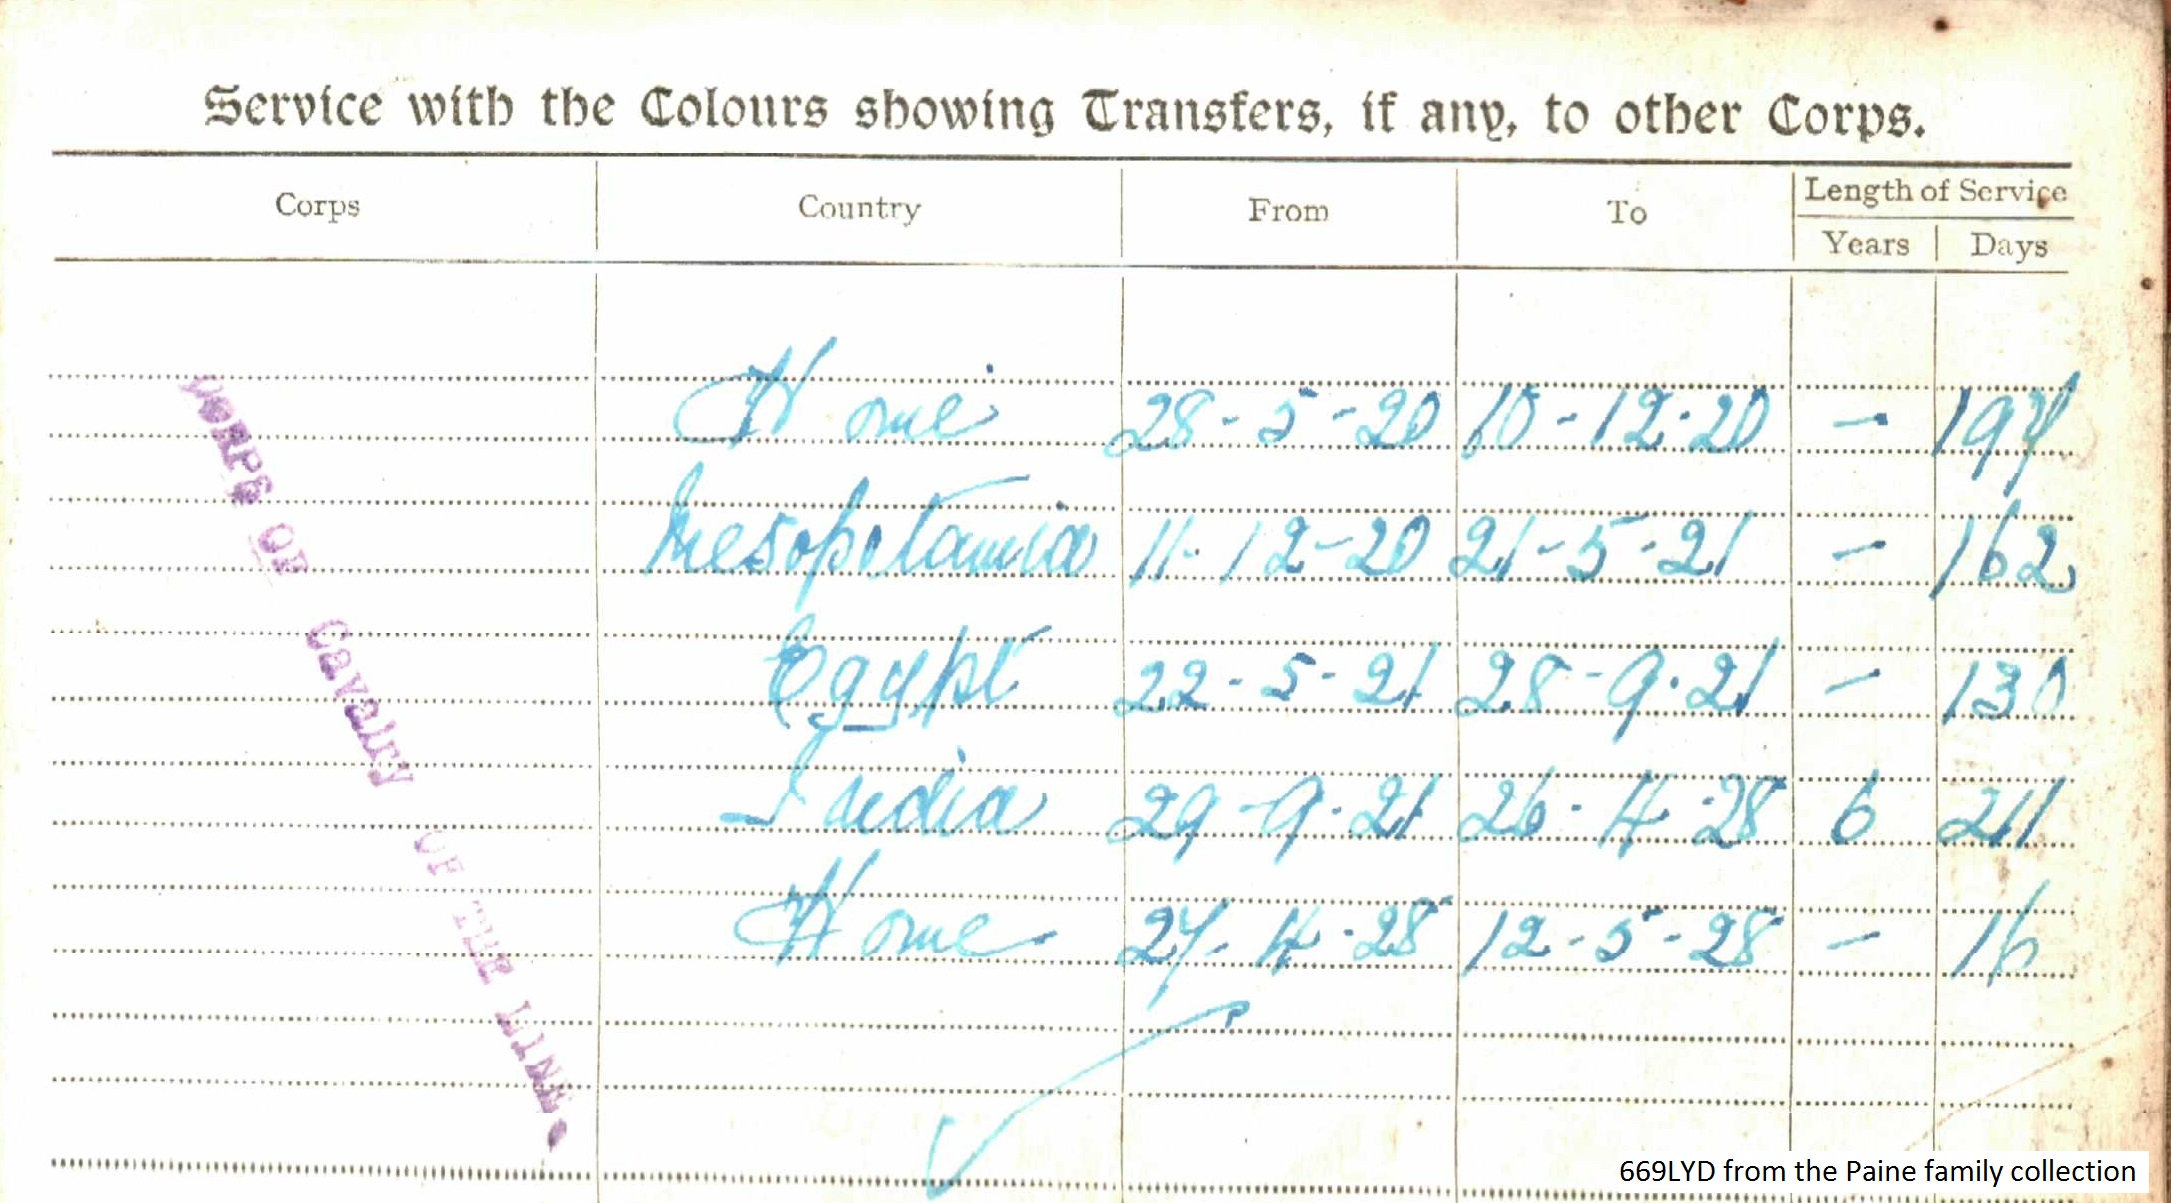 George Paine Service Certificate